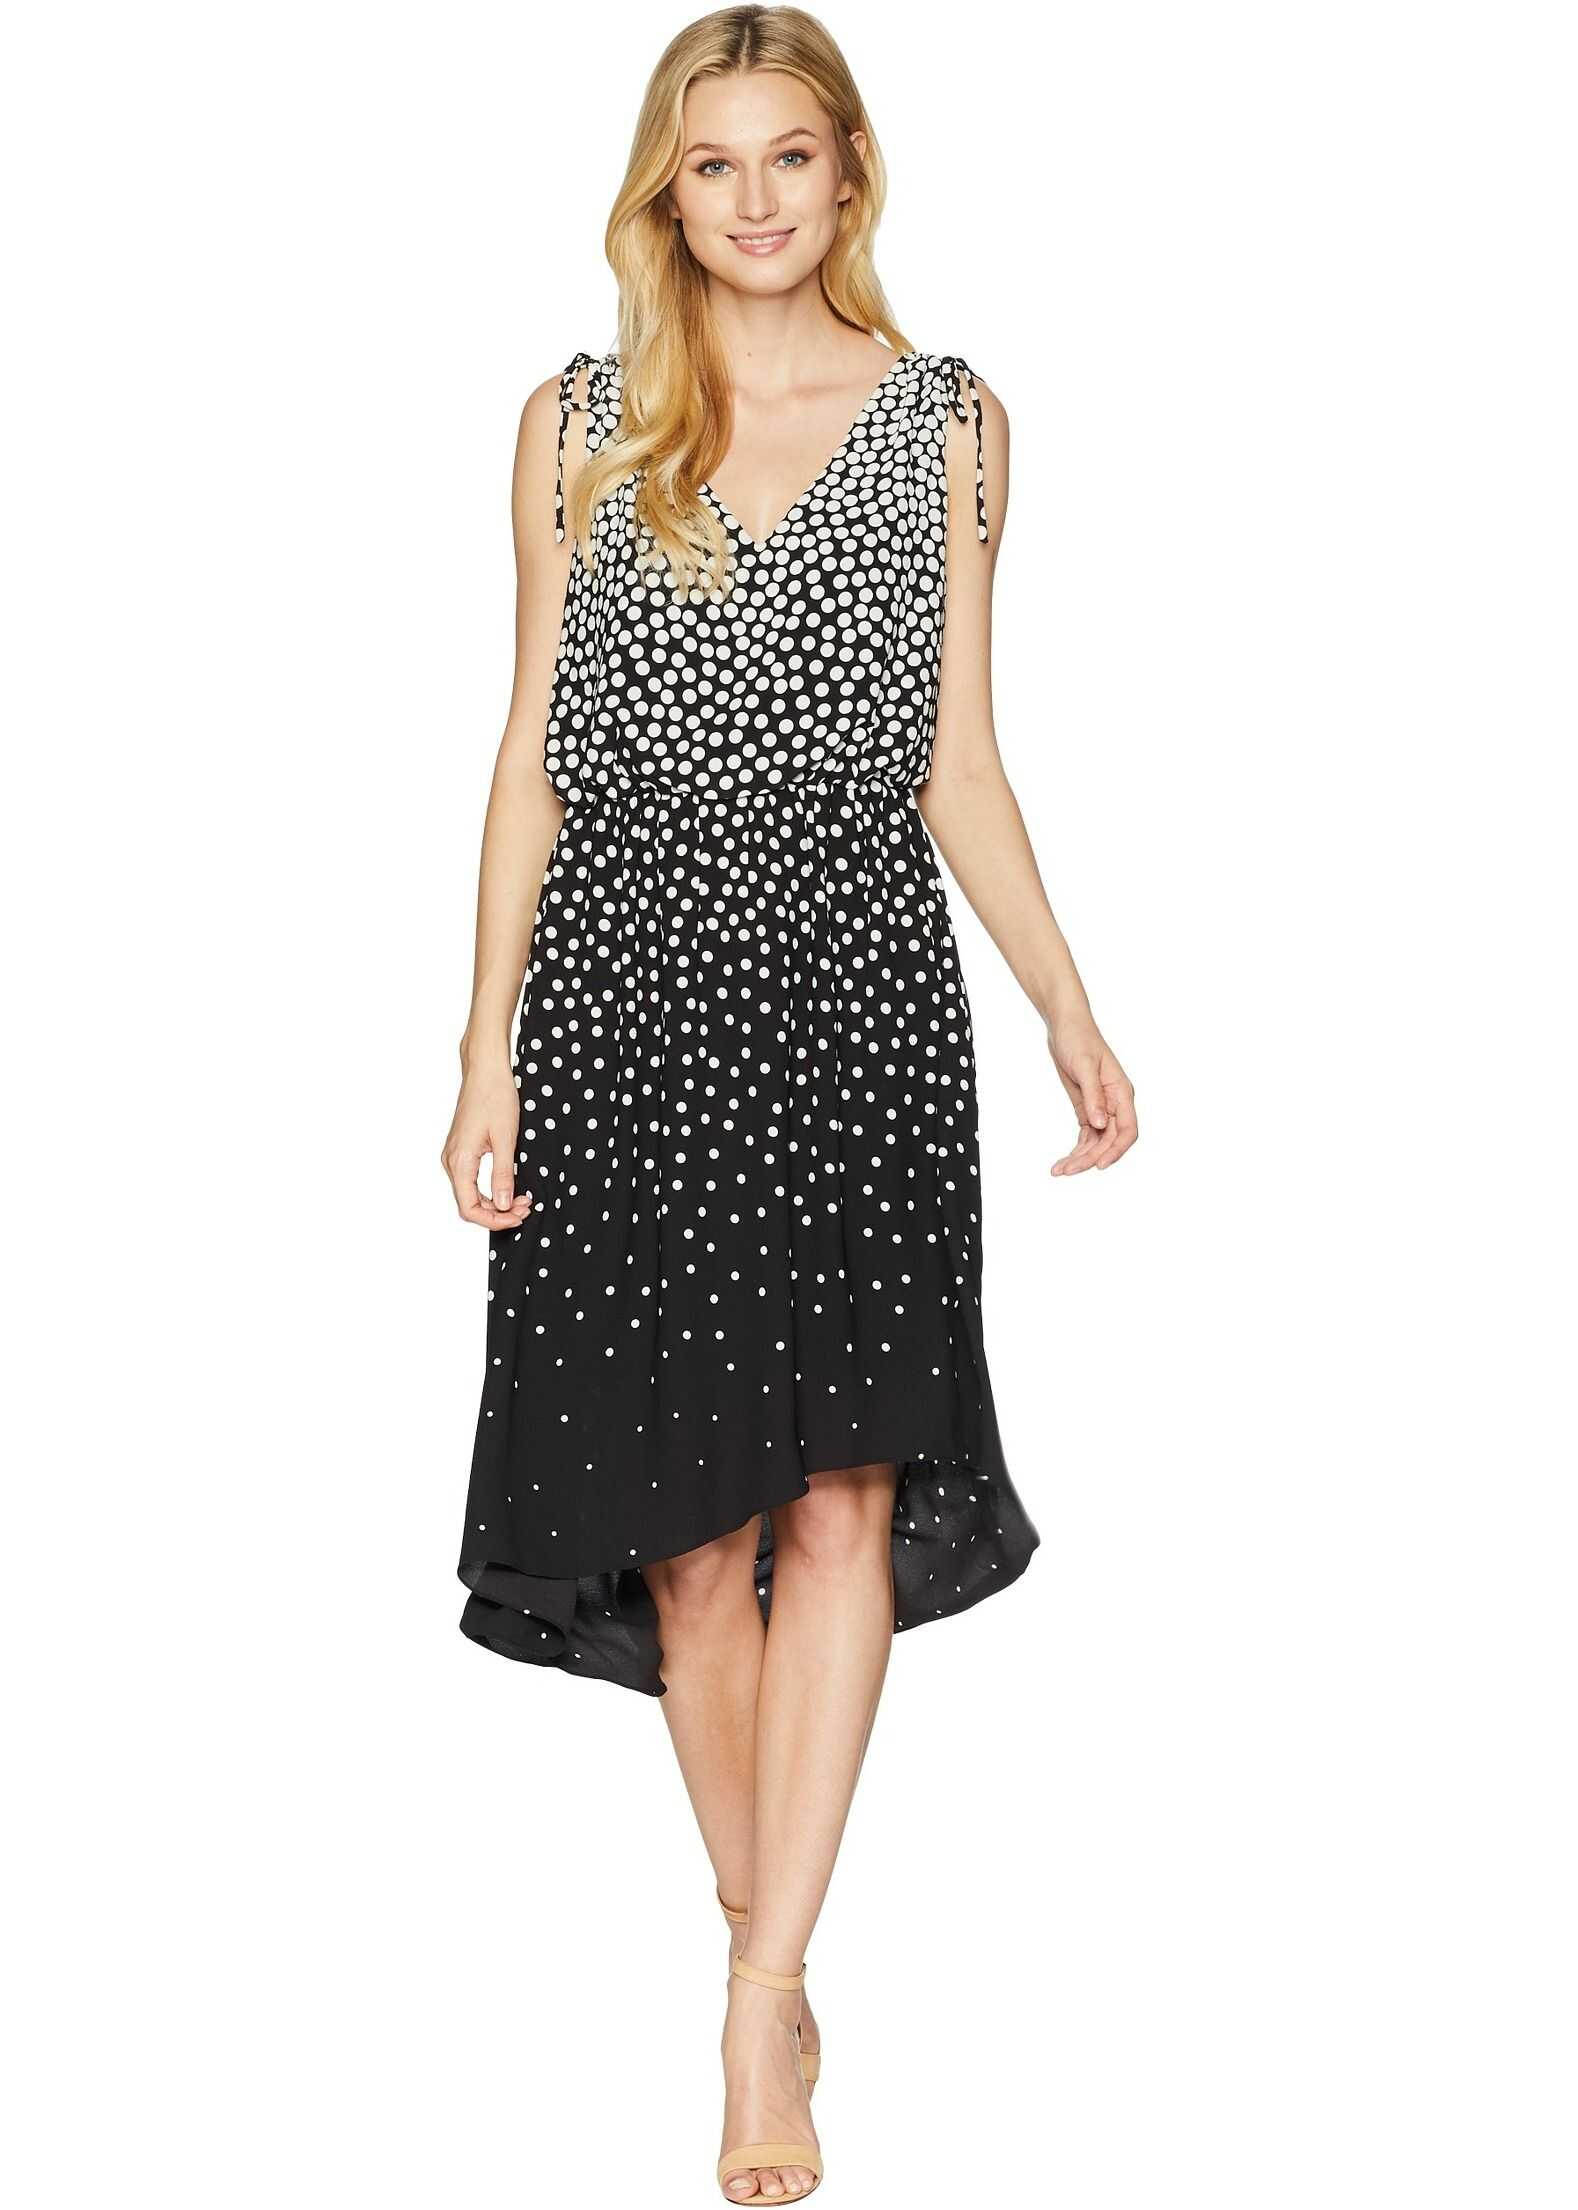 Adrianna Papell Moody Dot High-Low Dress Black/Ecru